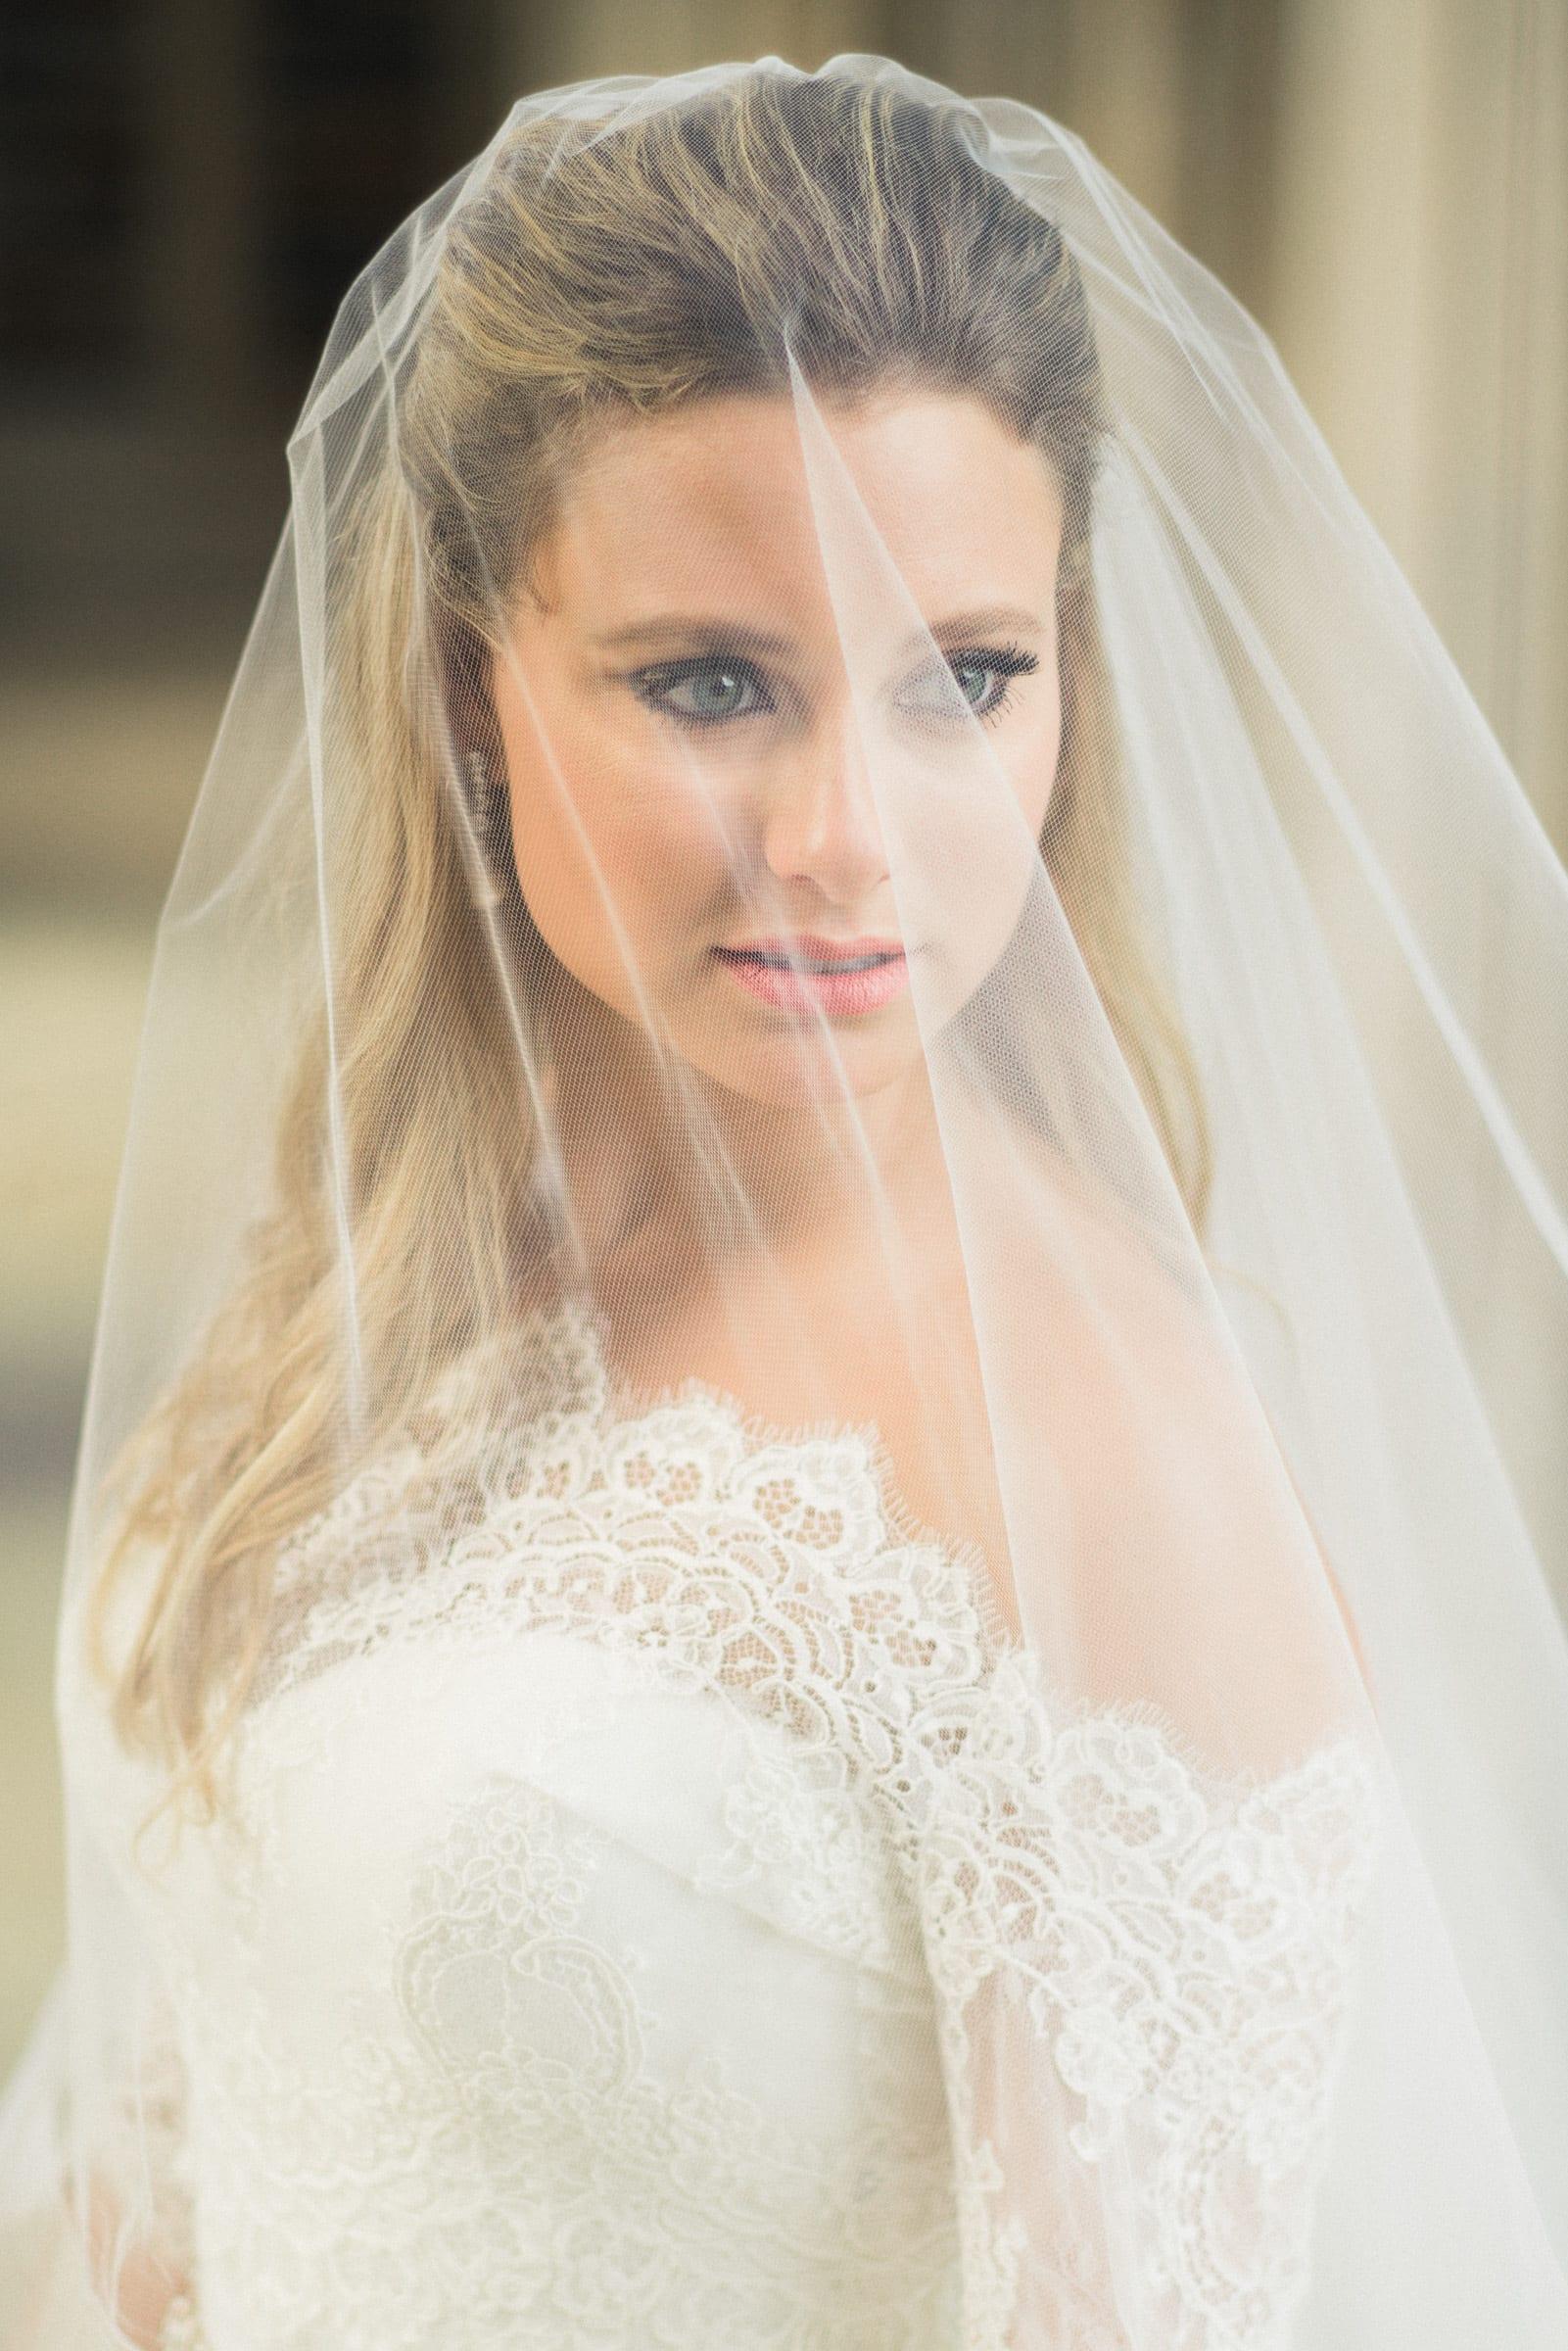 Duke Chapel Wedding Photo Veiled Bridal Portrait in Color by Joe Payne